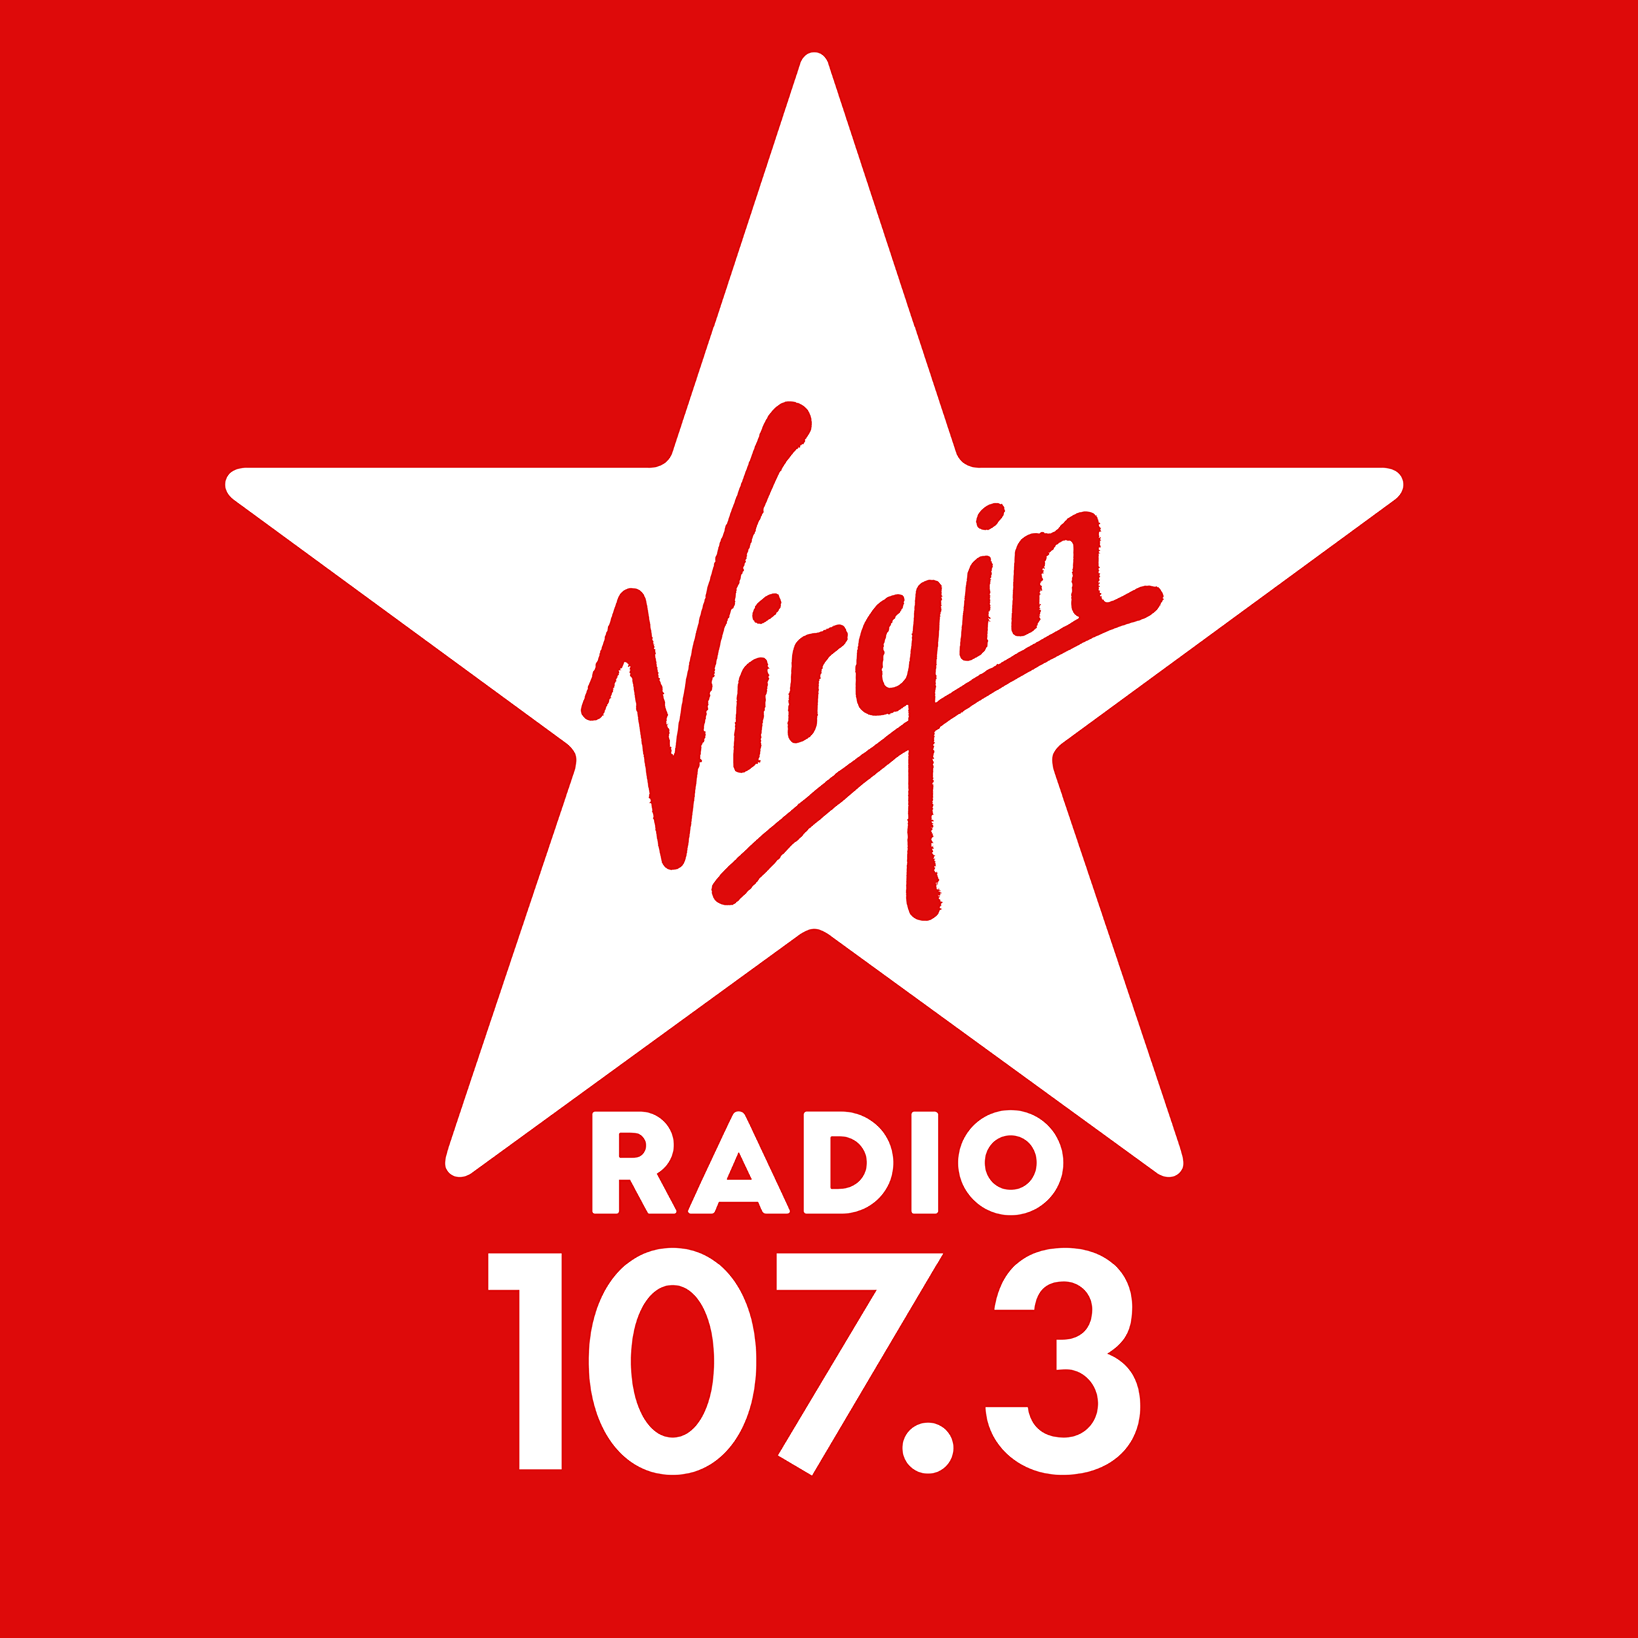 CHBE Virgin Radio